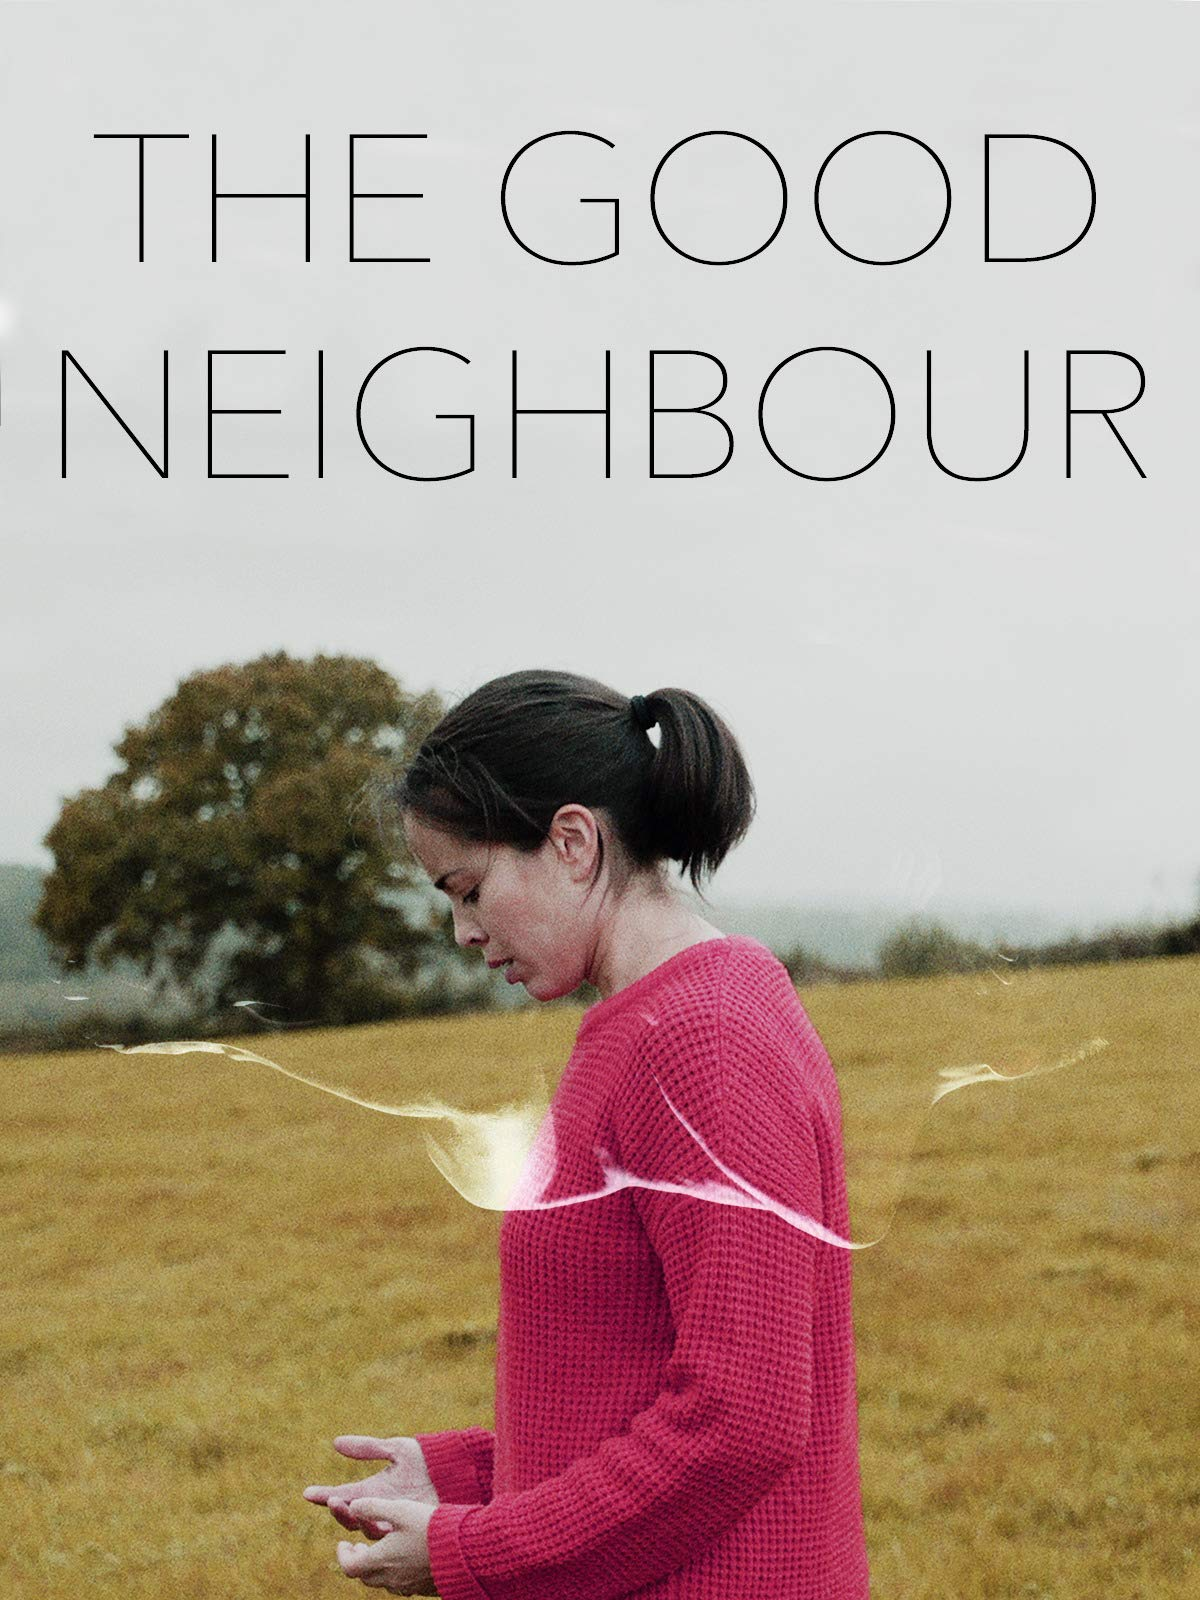 Neighbour neighbour